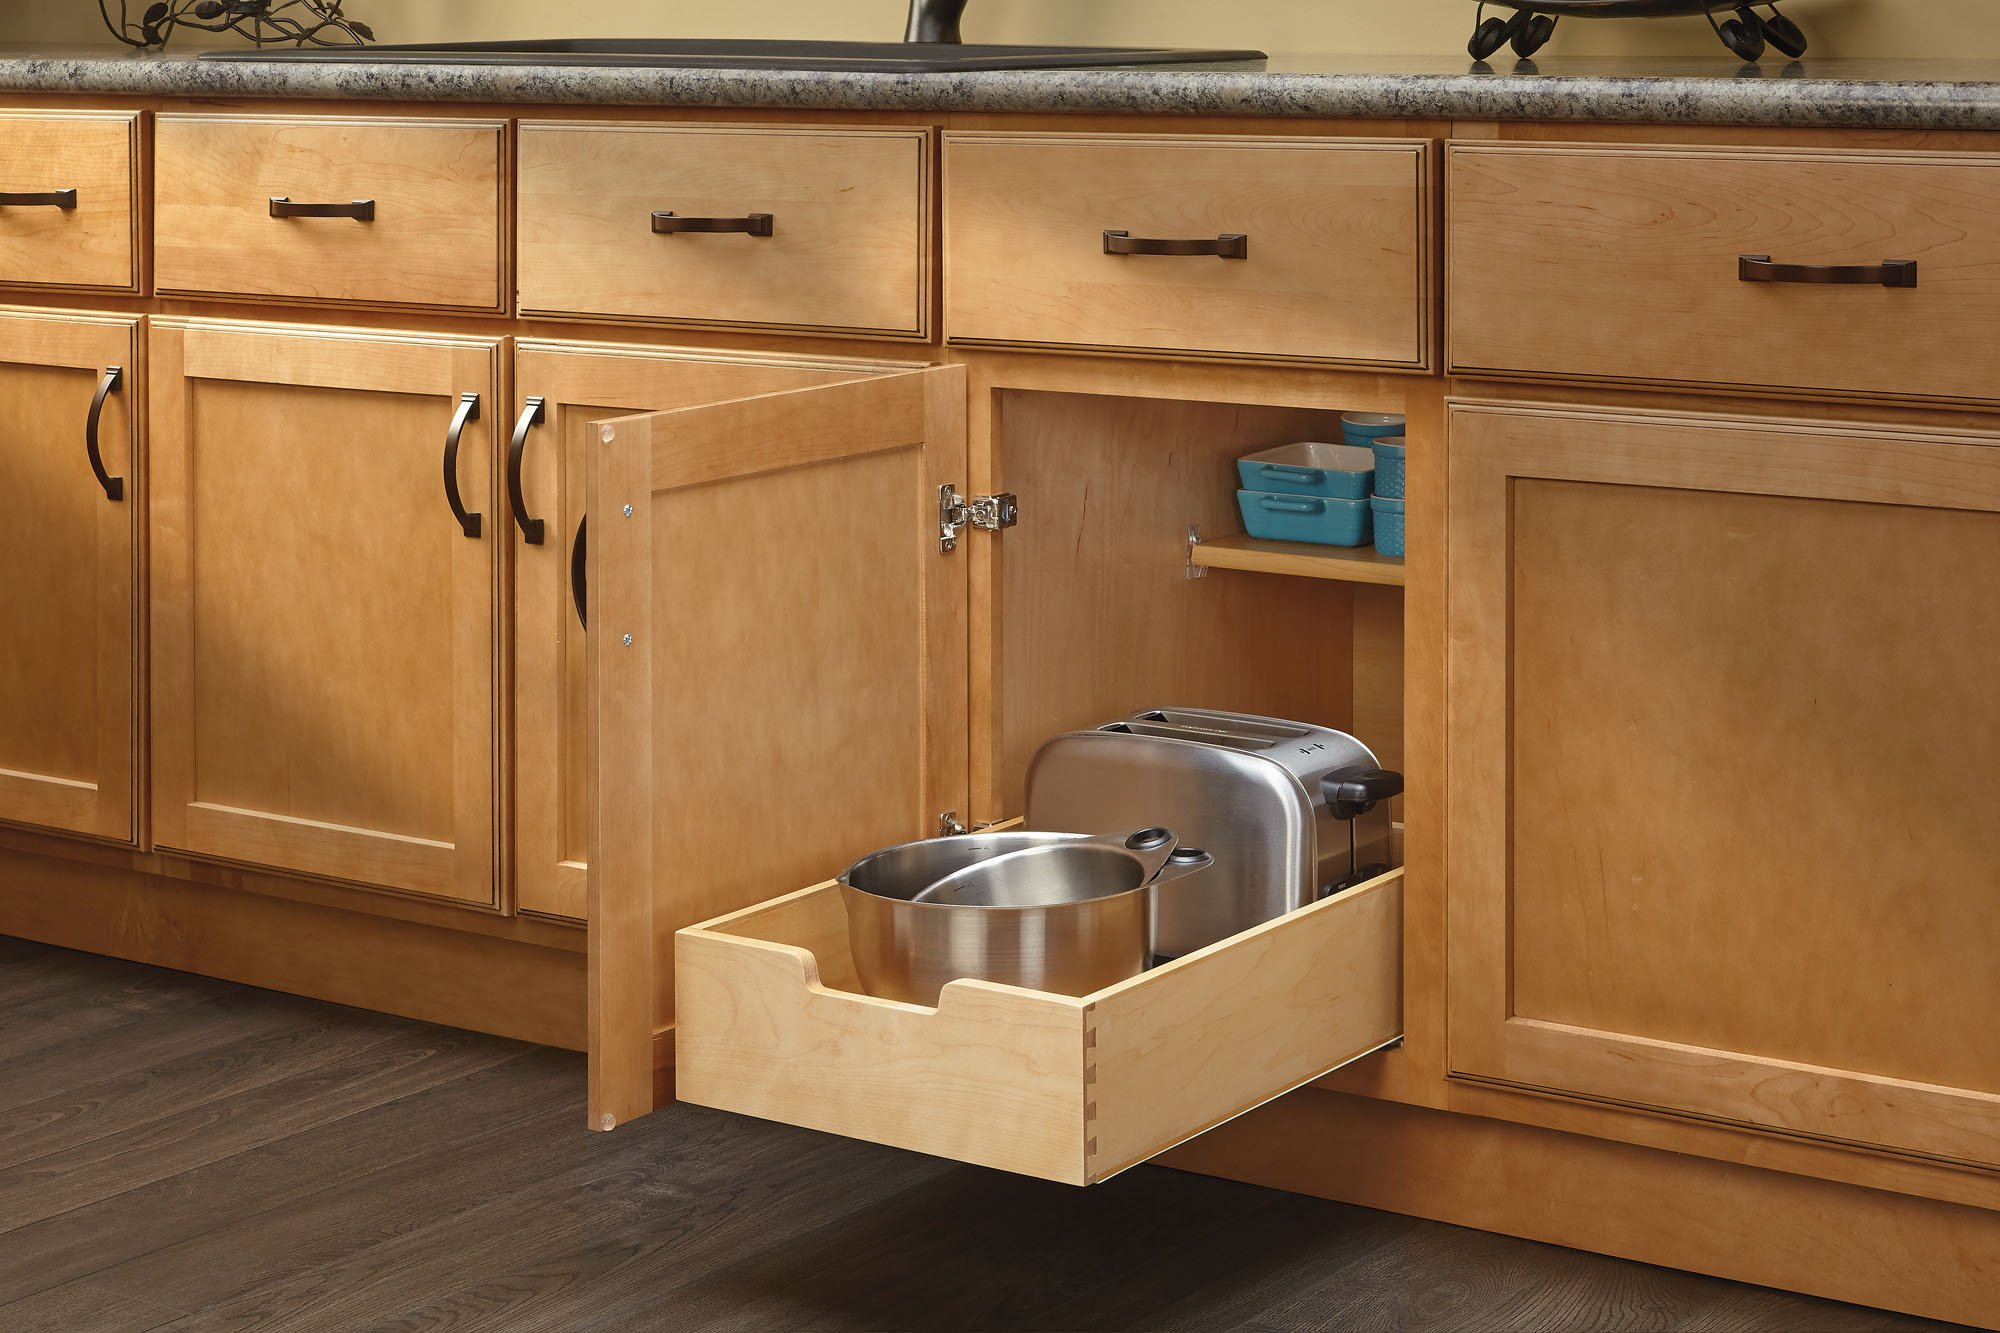 Rev-A-Shelf 4WDB-15 - Medium Wood Base Cabinet Pull-Out Drawer